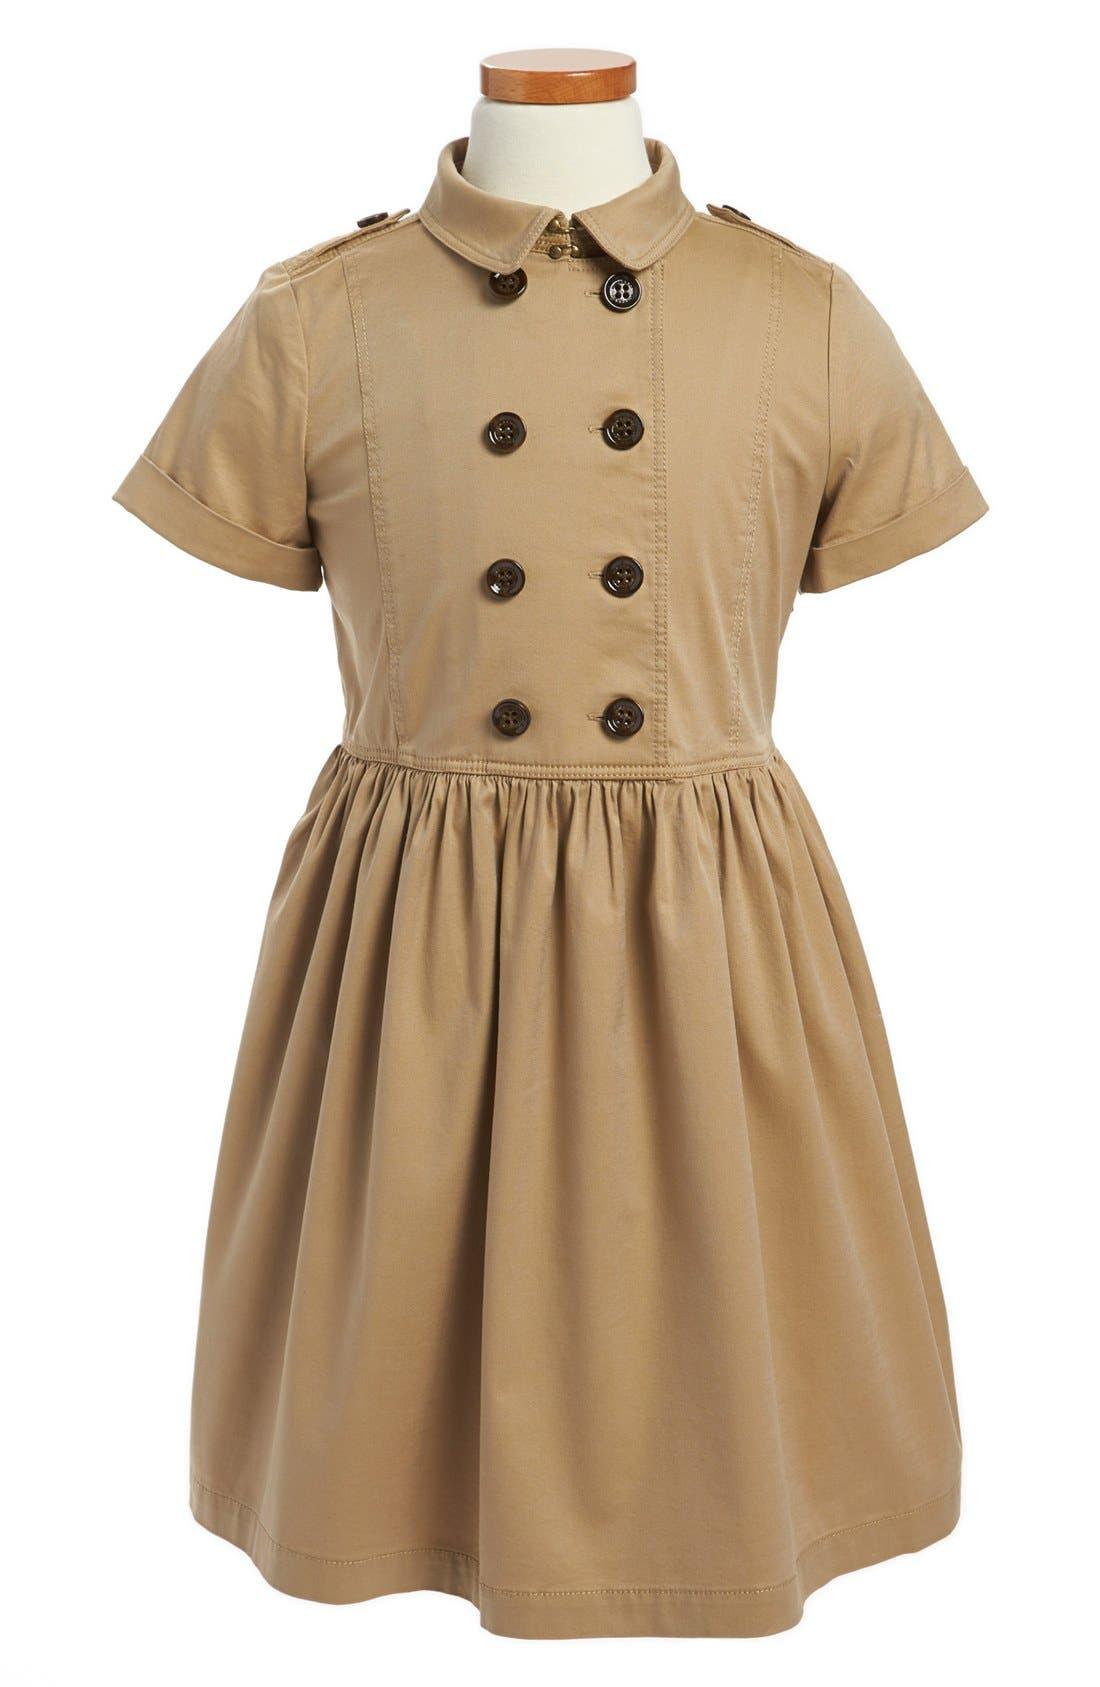 Alternate Image 1 Selected - Burberry 'Elive' Trench Dress (Little Girls & Big Girls)